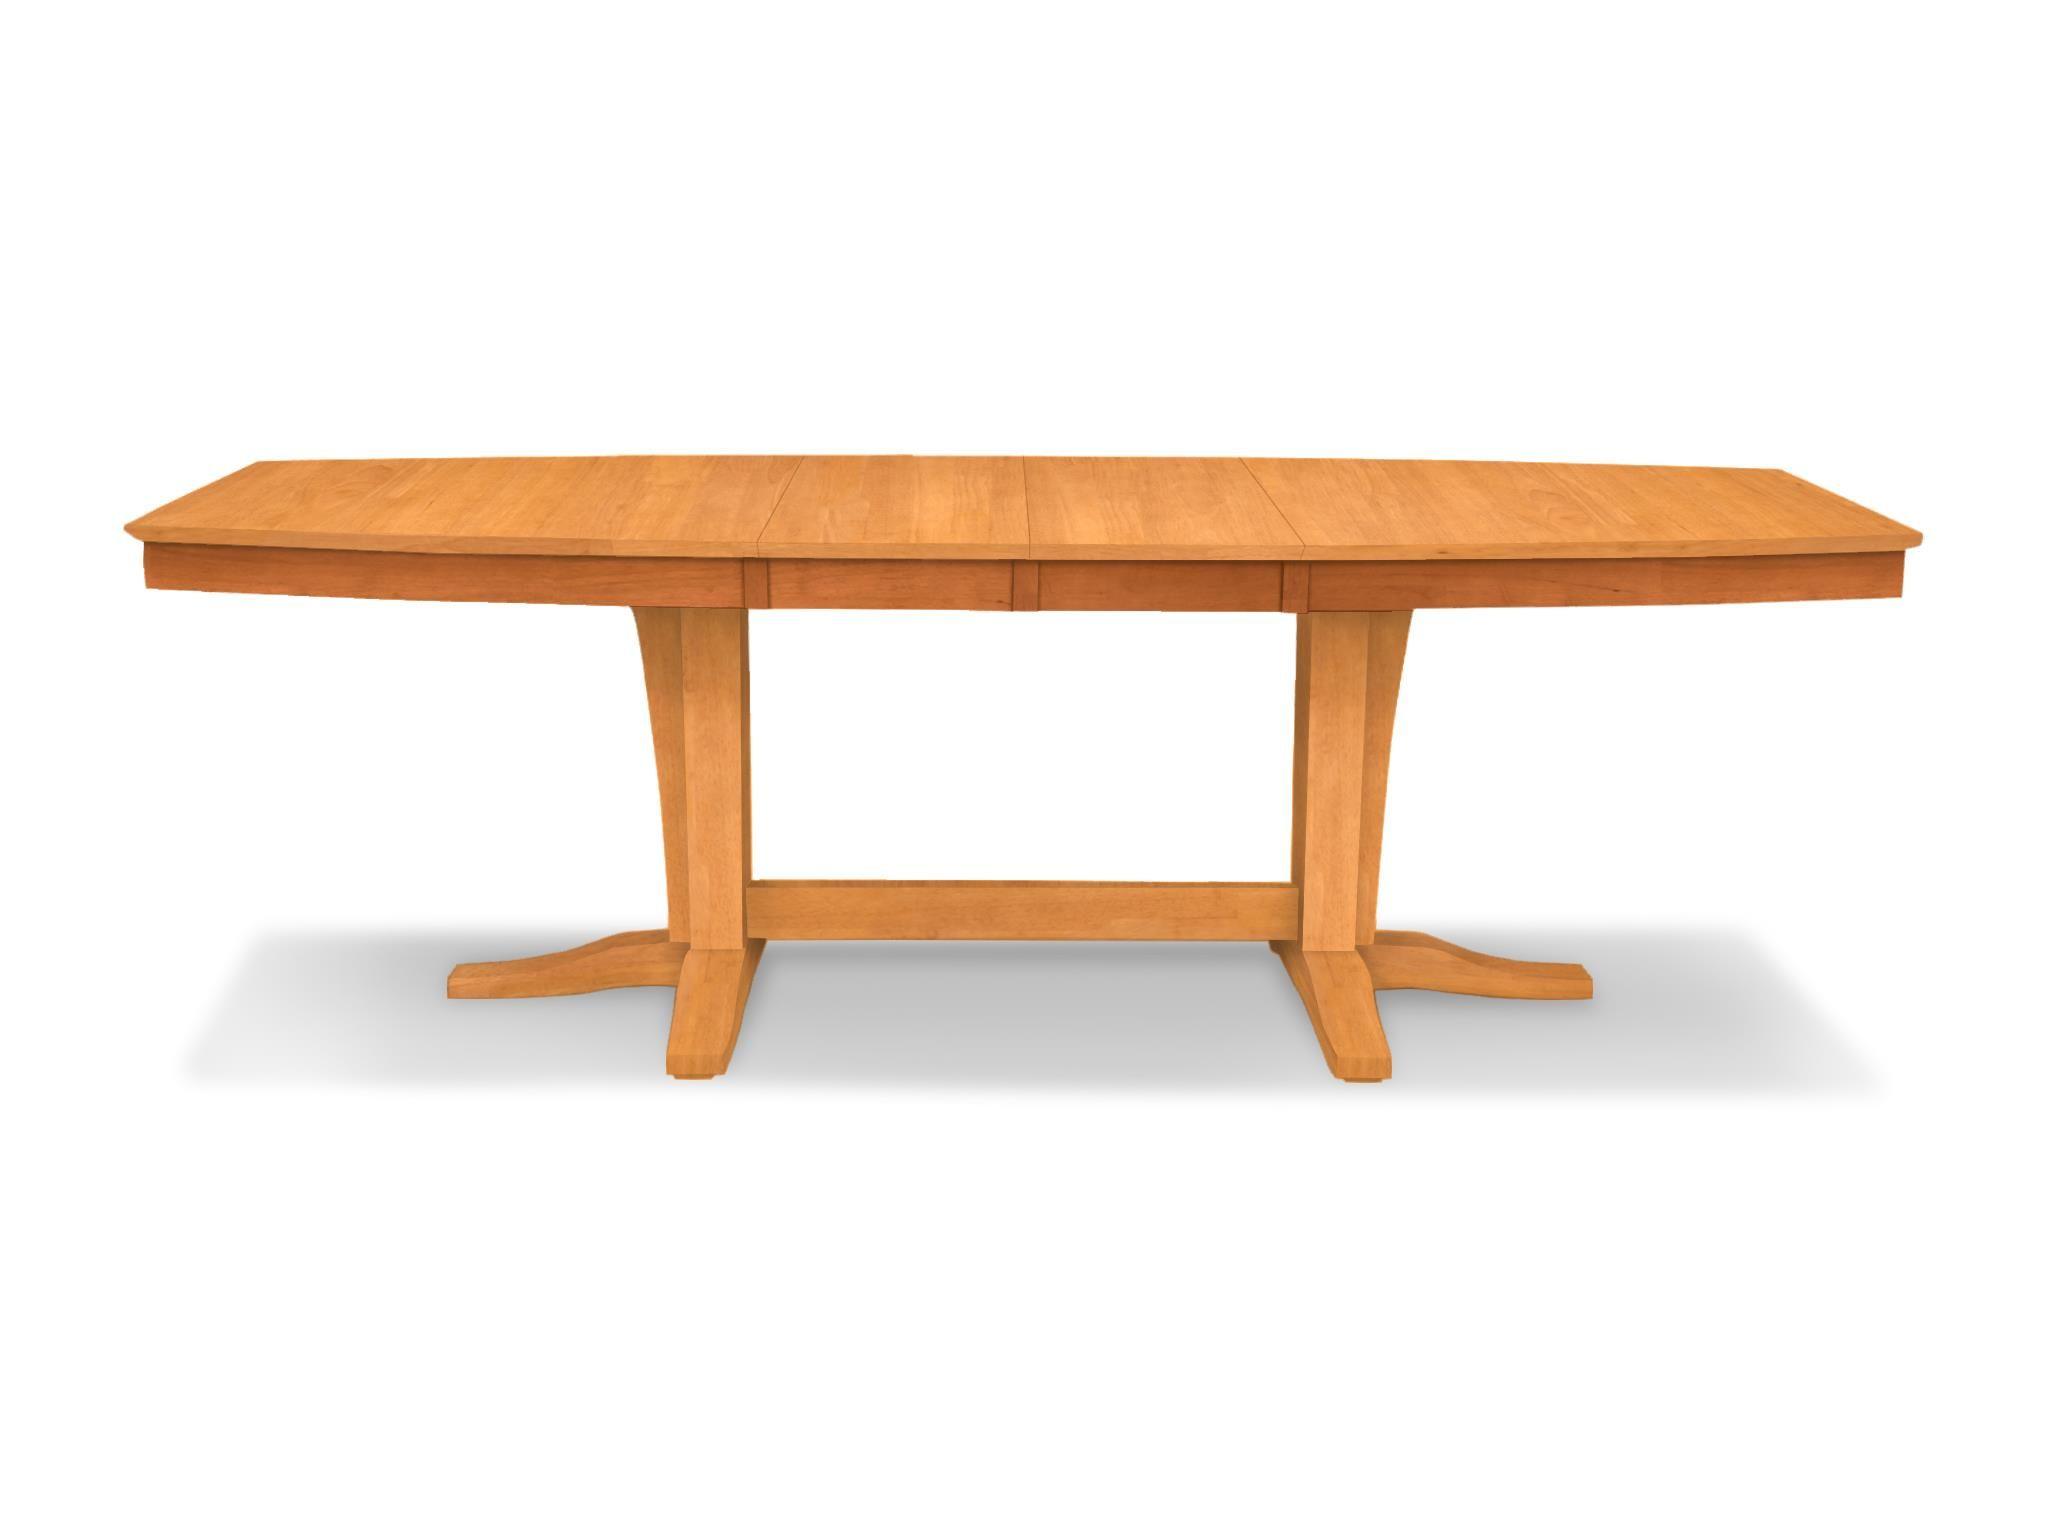 John Thomas Dining Room Milano Table (top only) / Milano Table Base T-4096XXT / T-4096XXB - Whitewood - Thomasville, NC